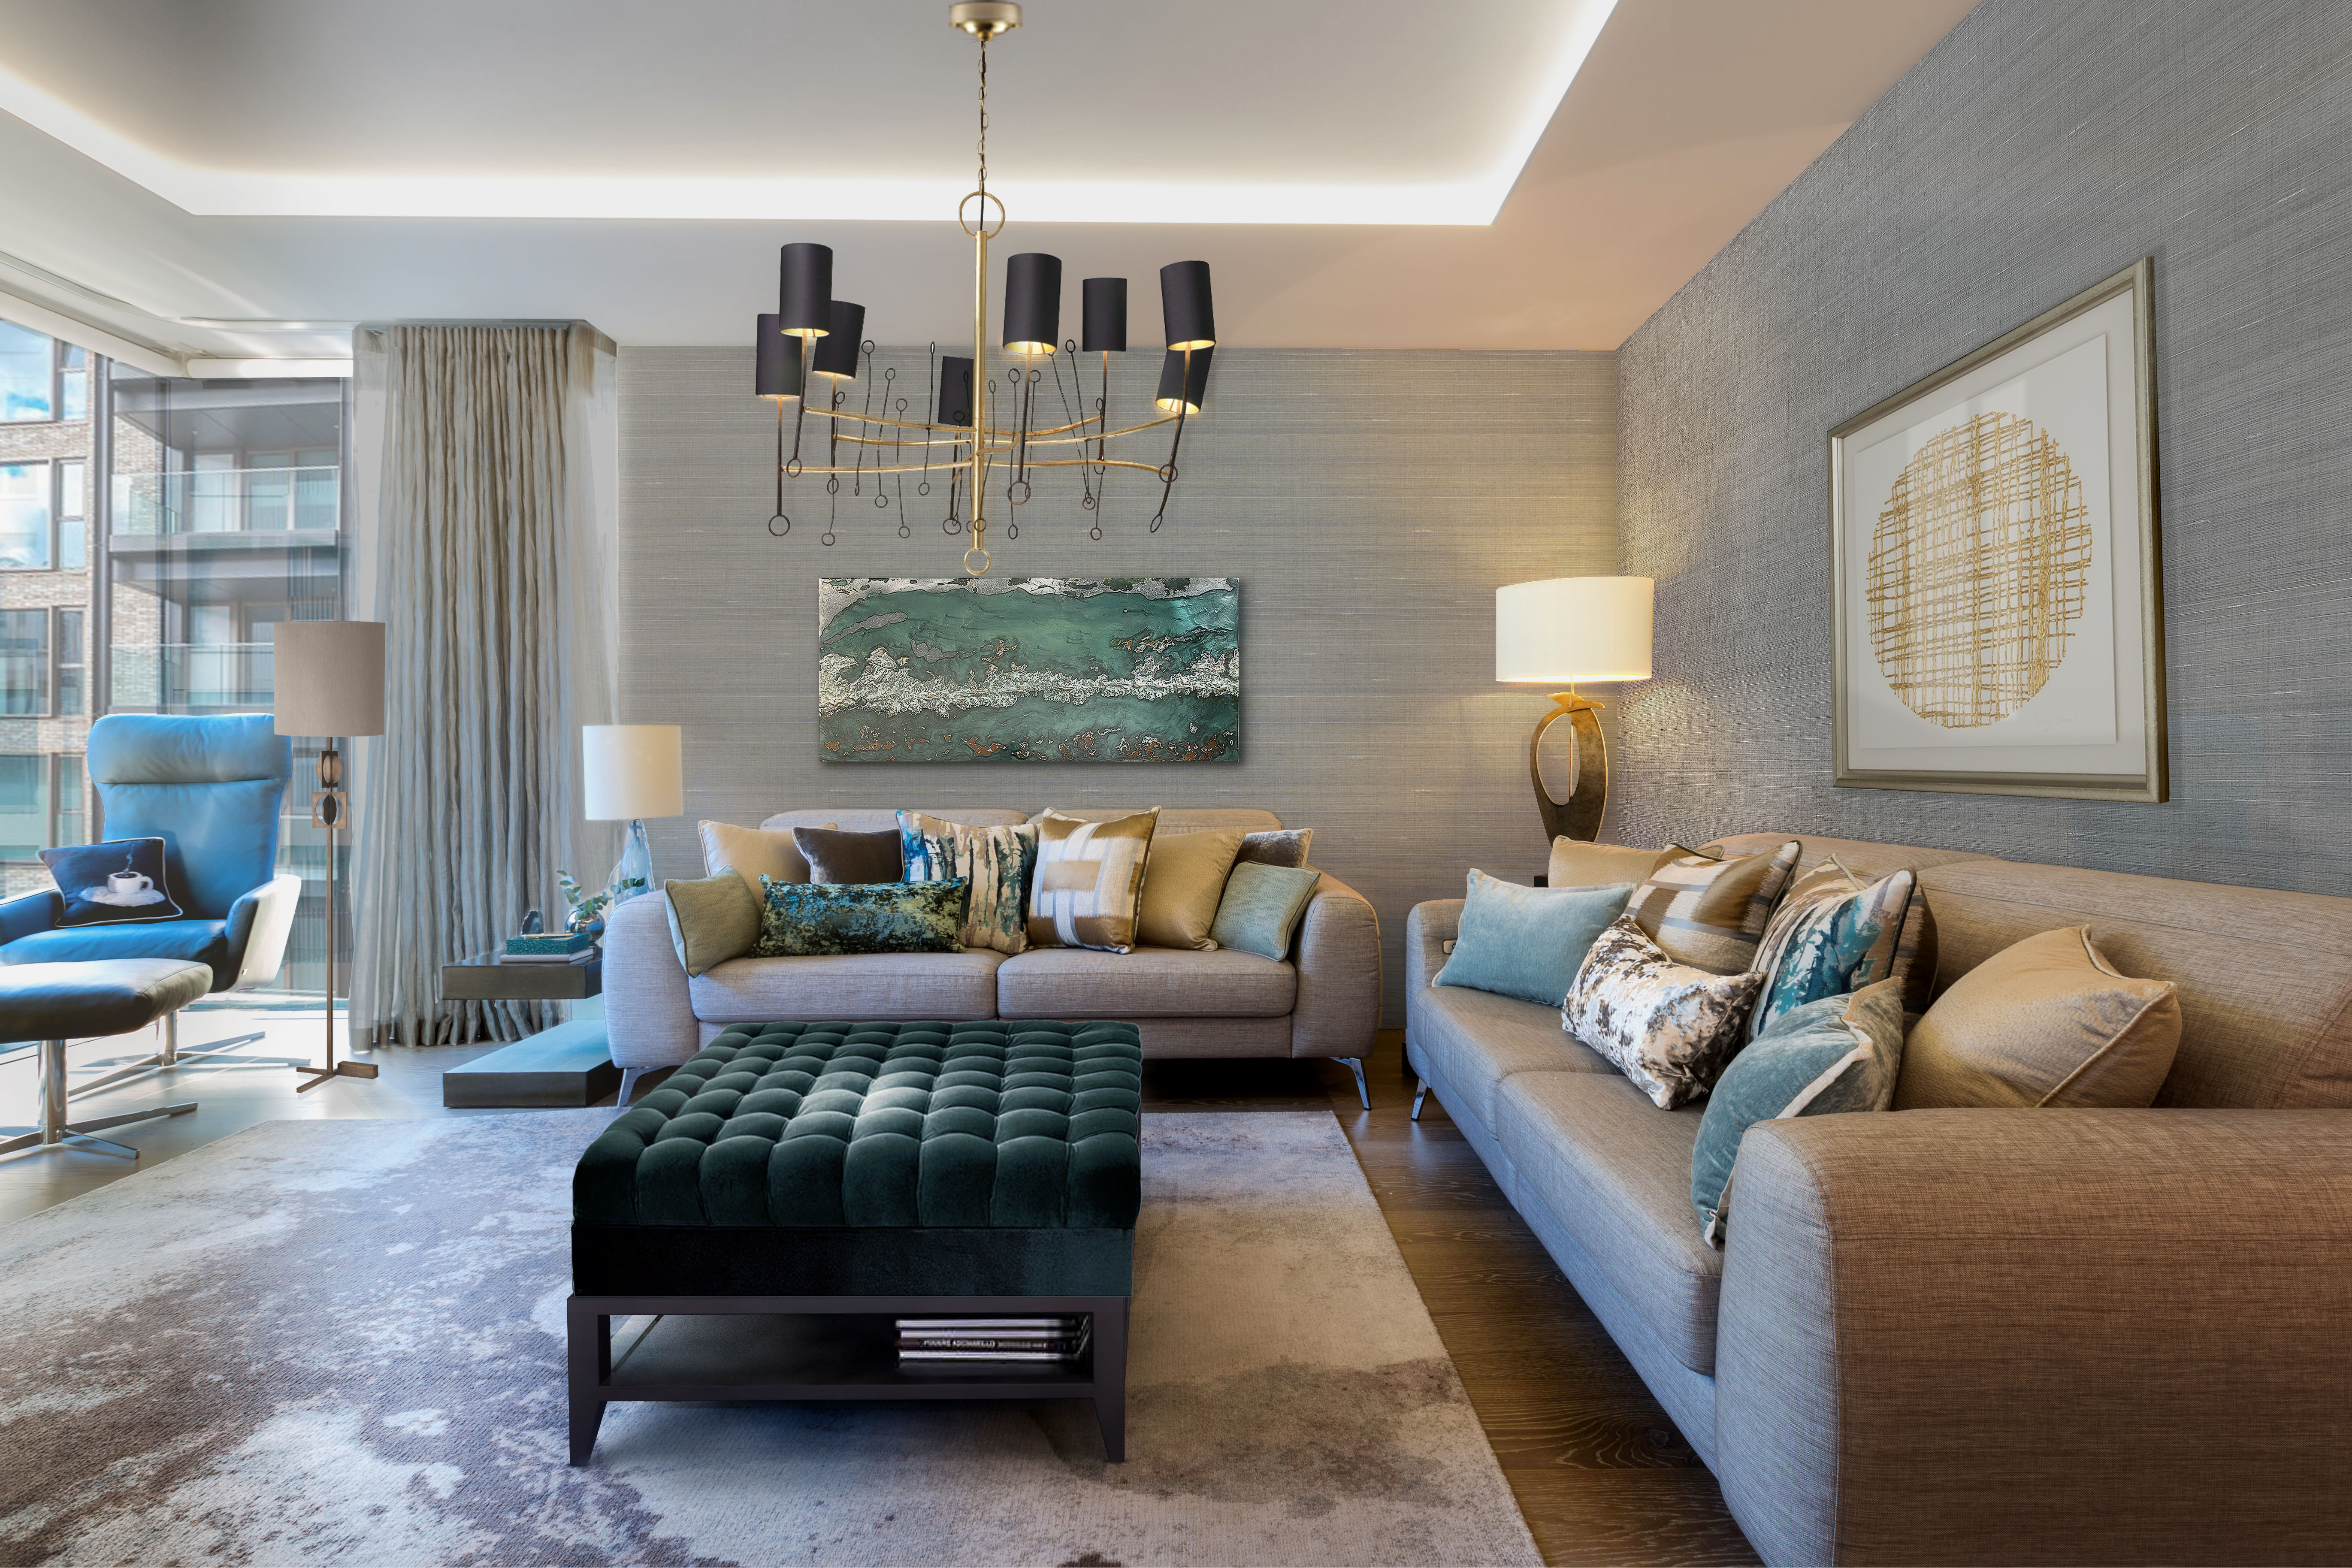 London interior design living room